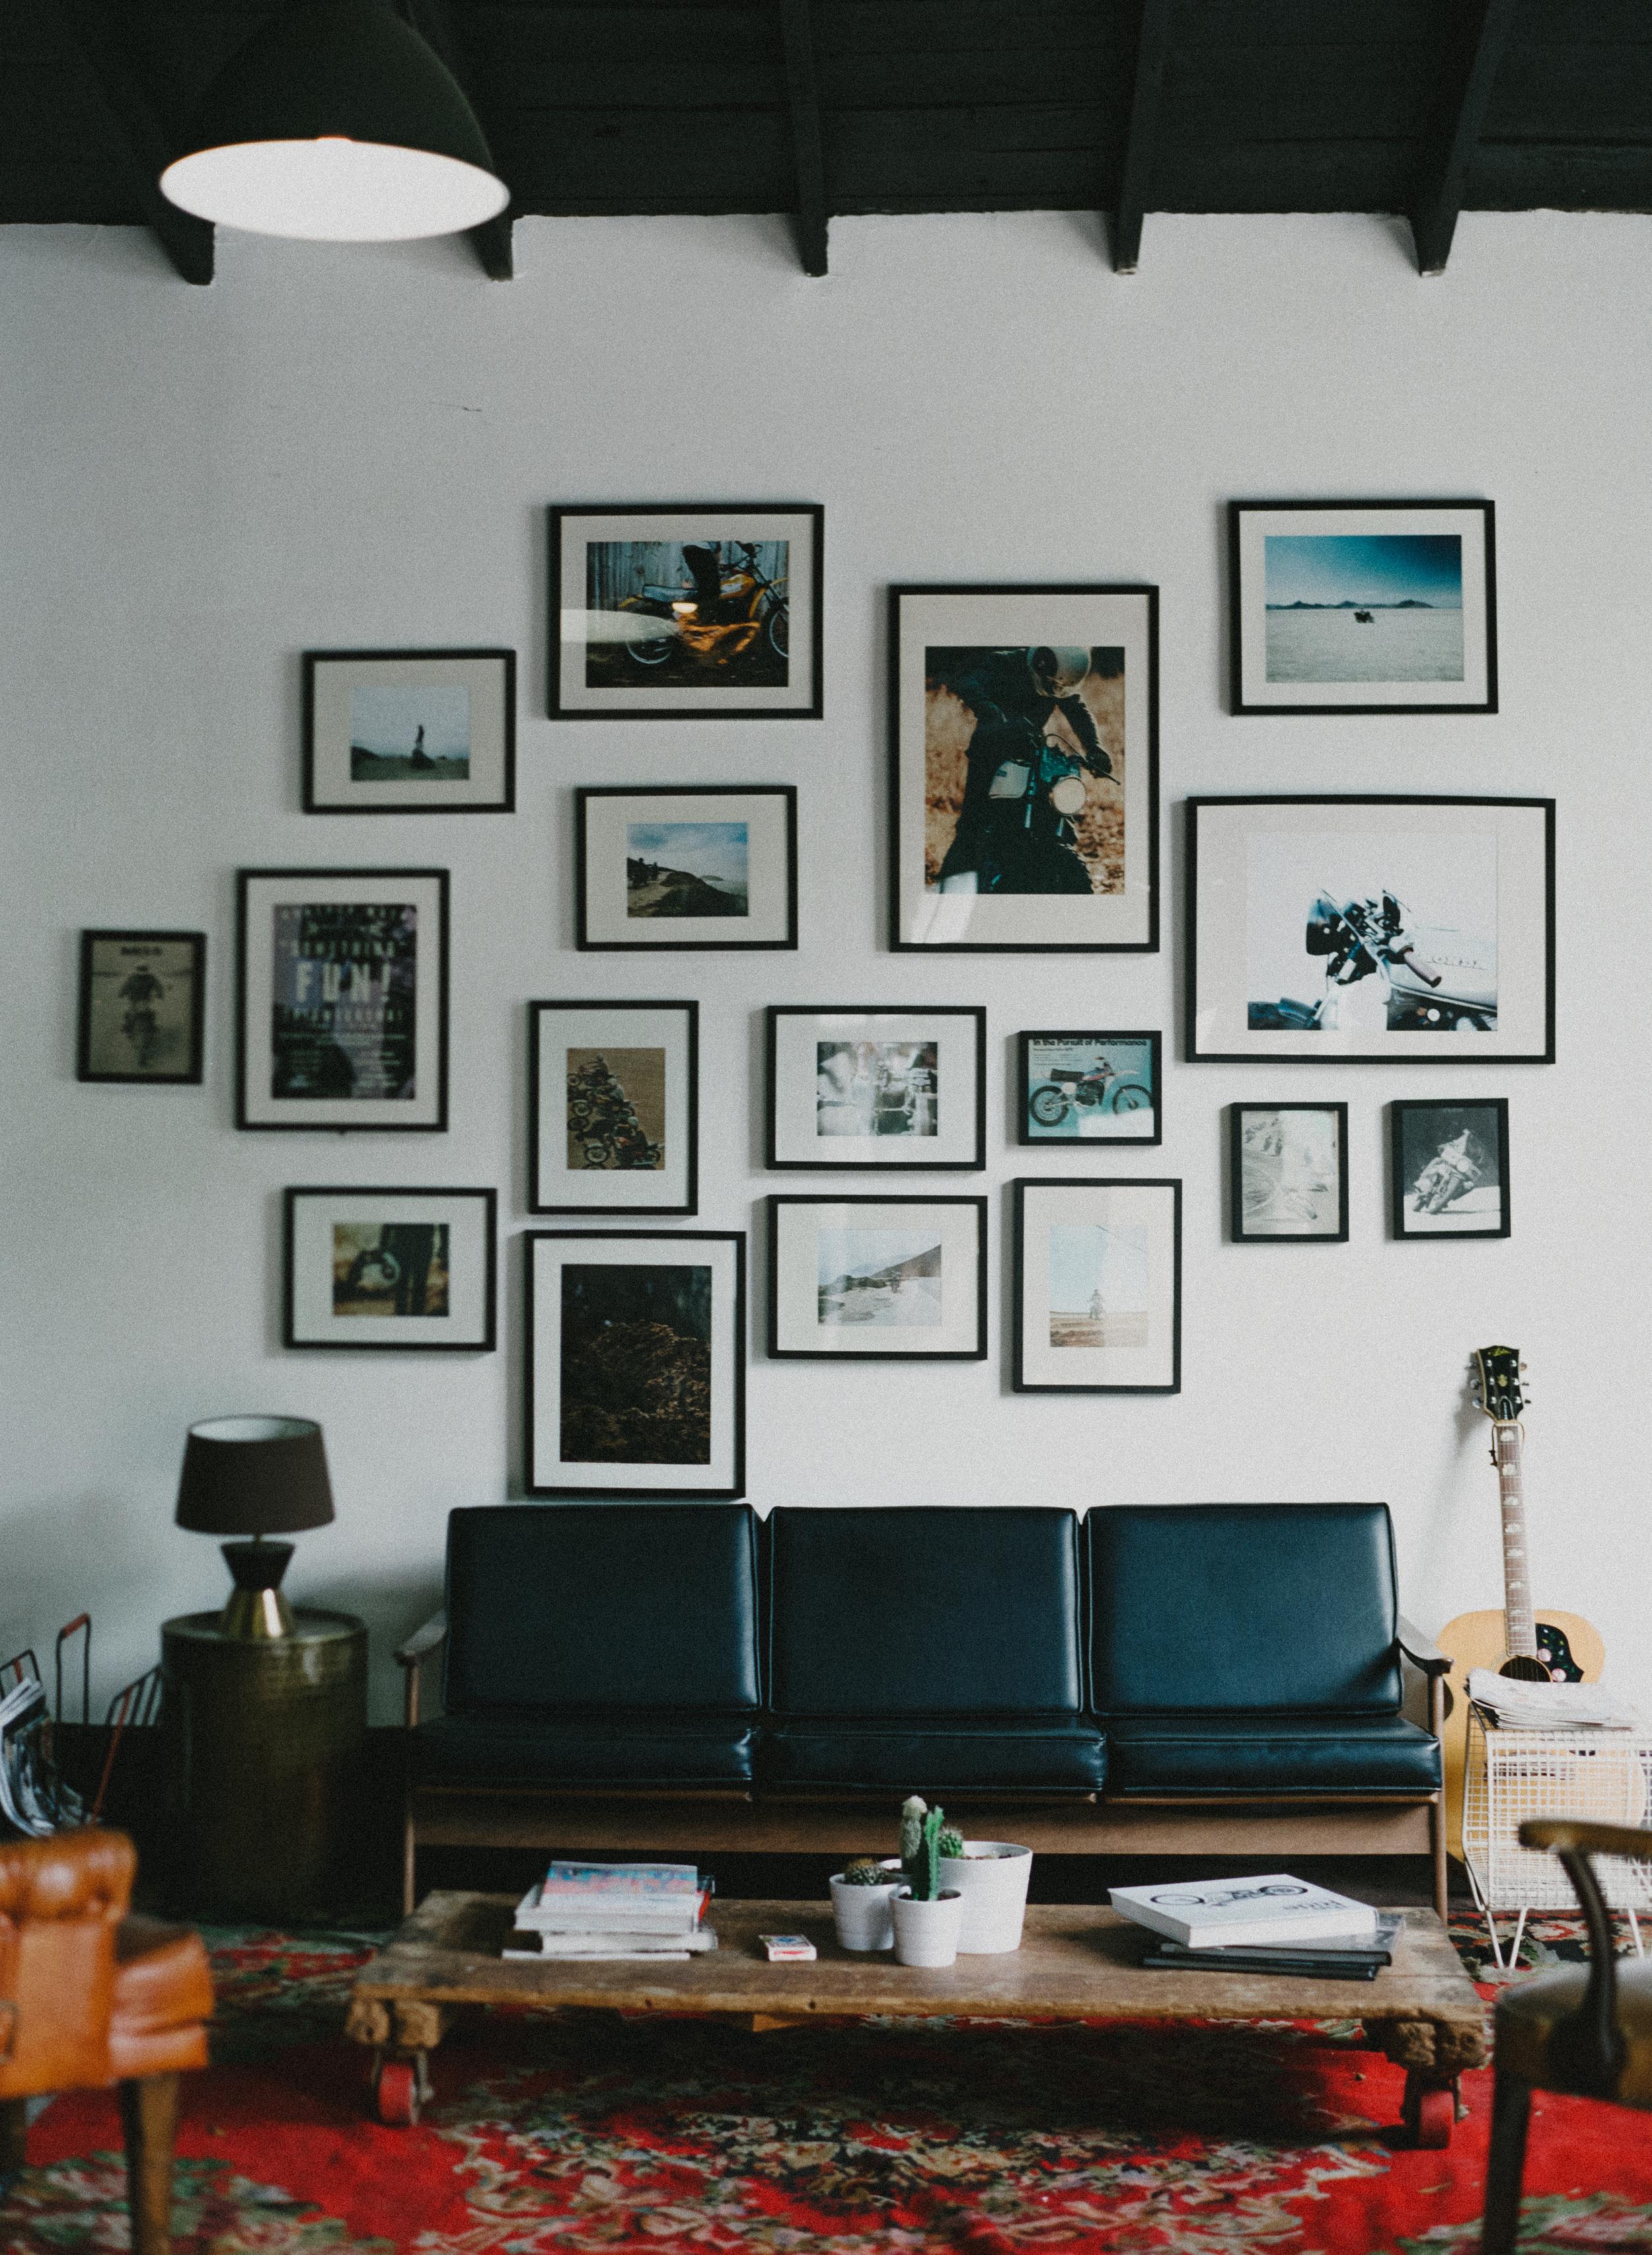 Interiors-9.jpg